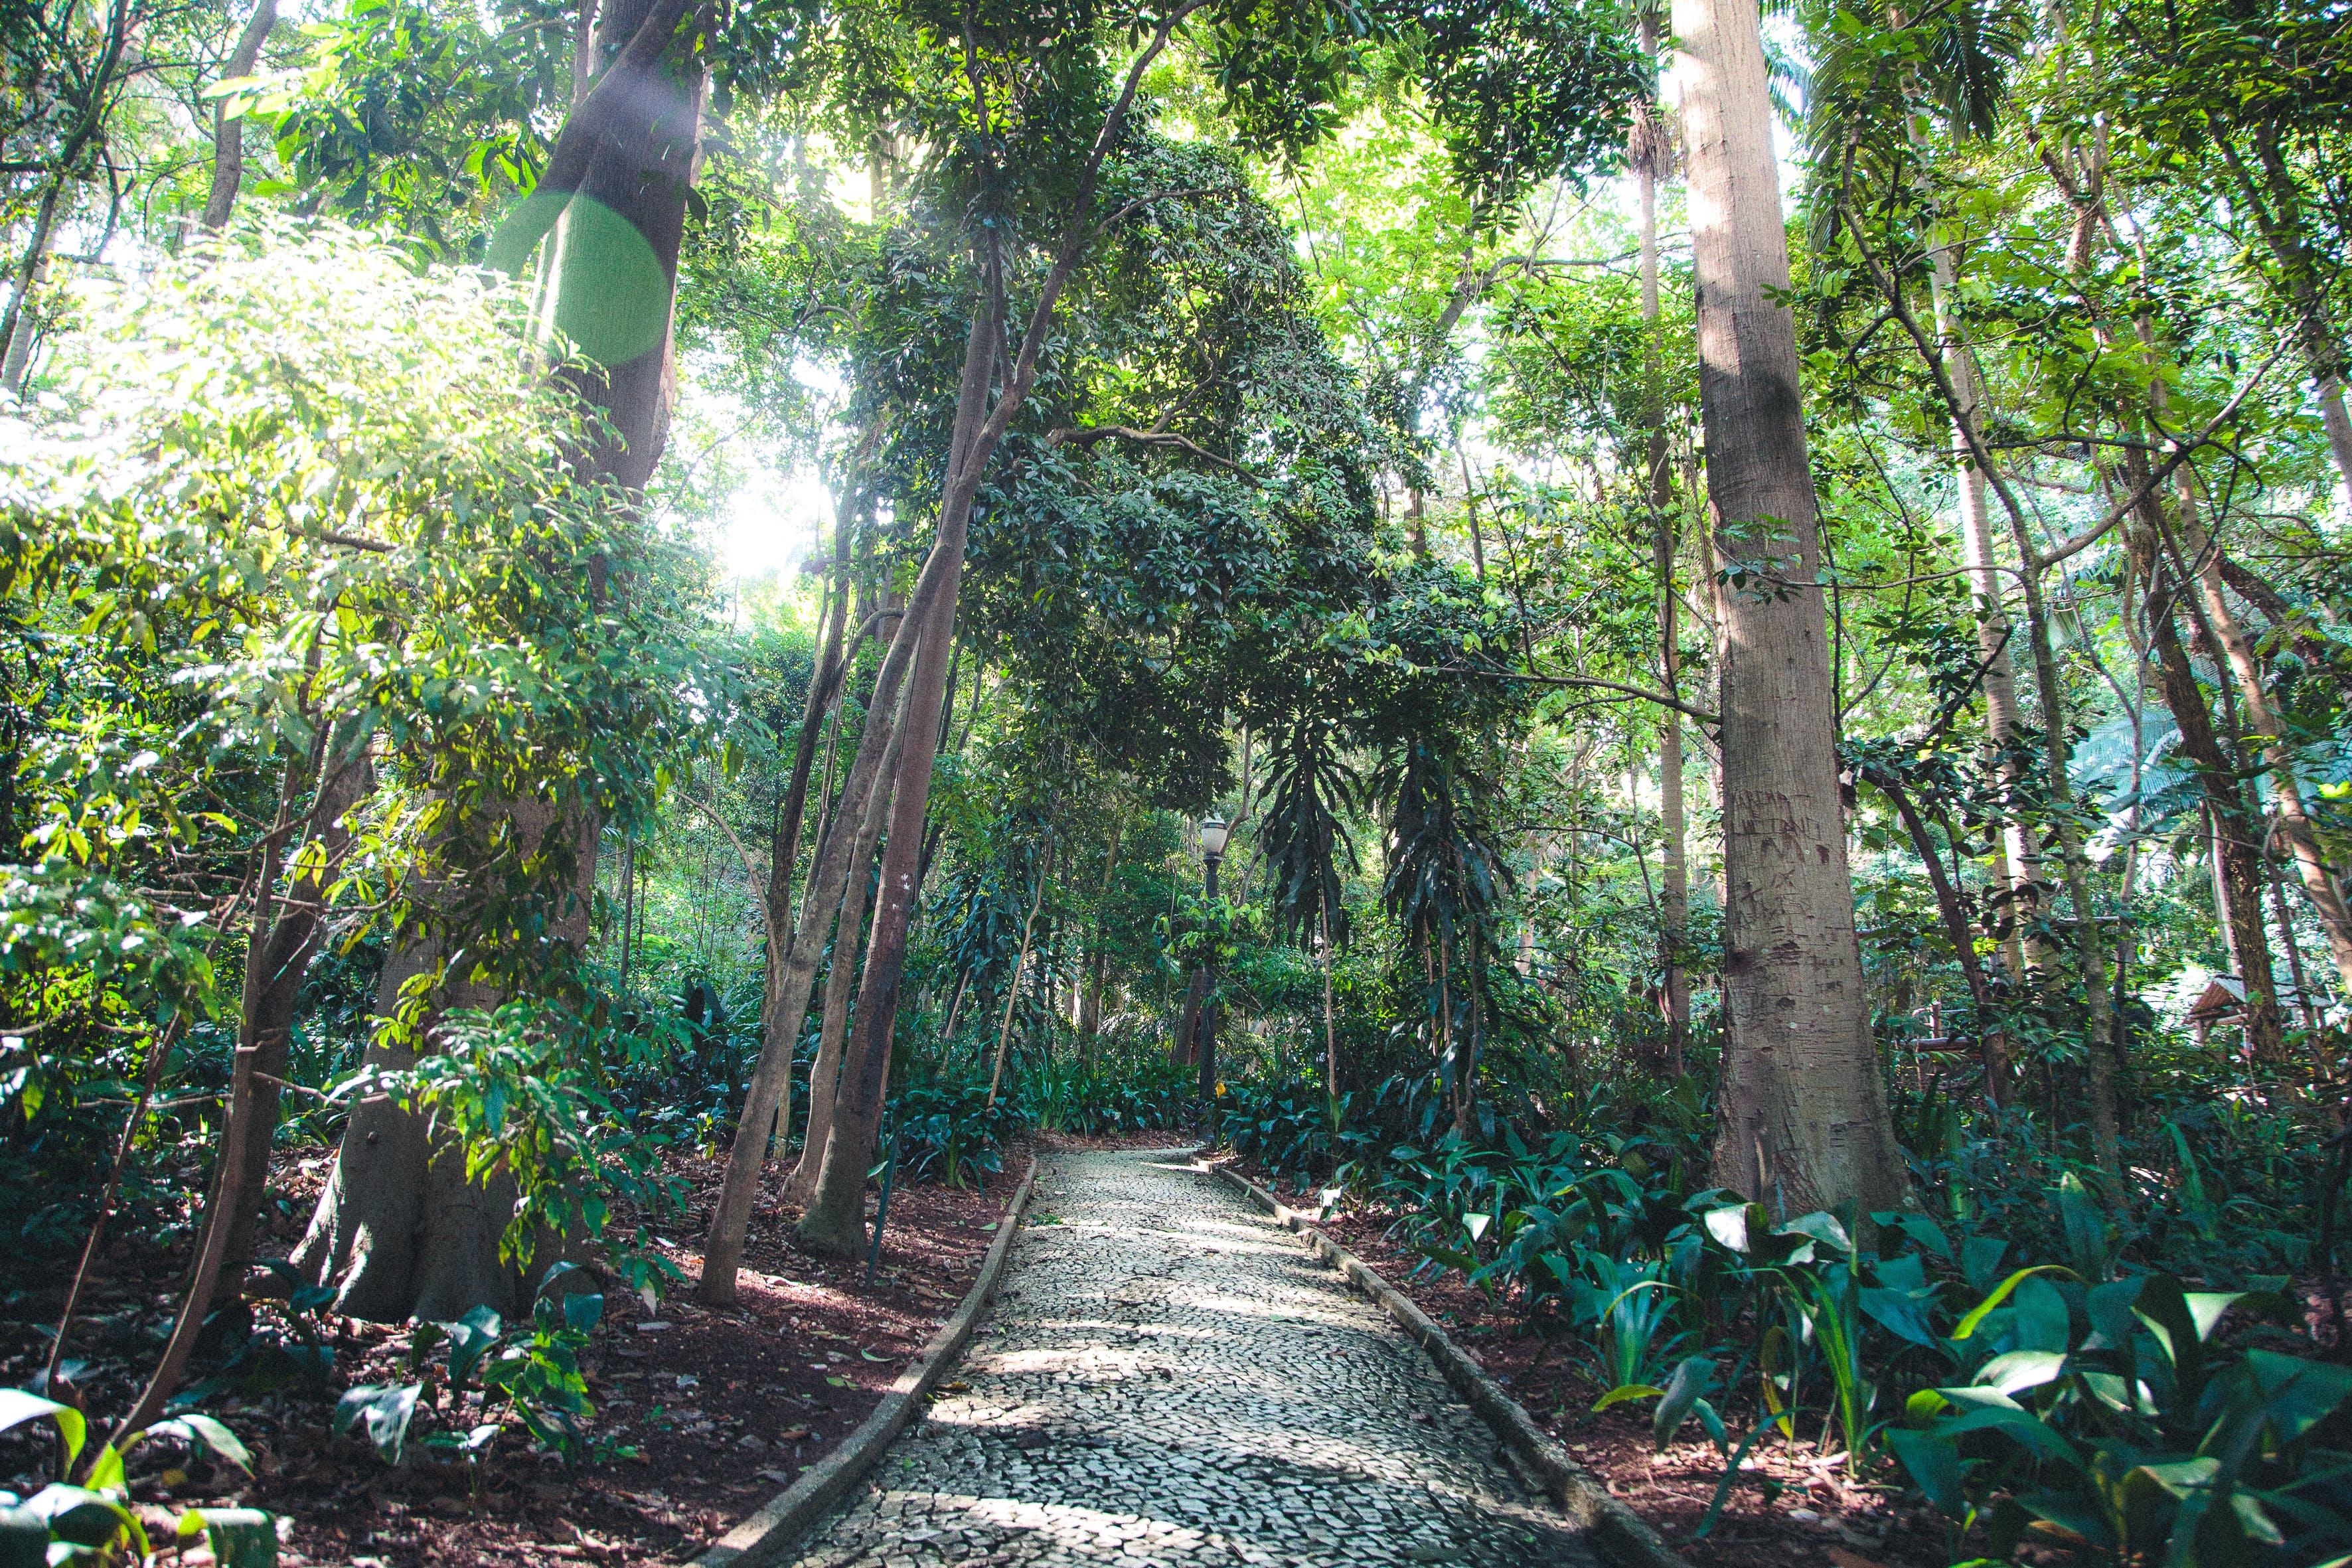 Pathway Underneath Trees